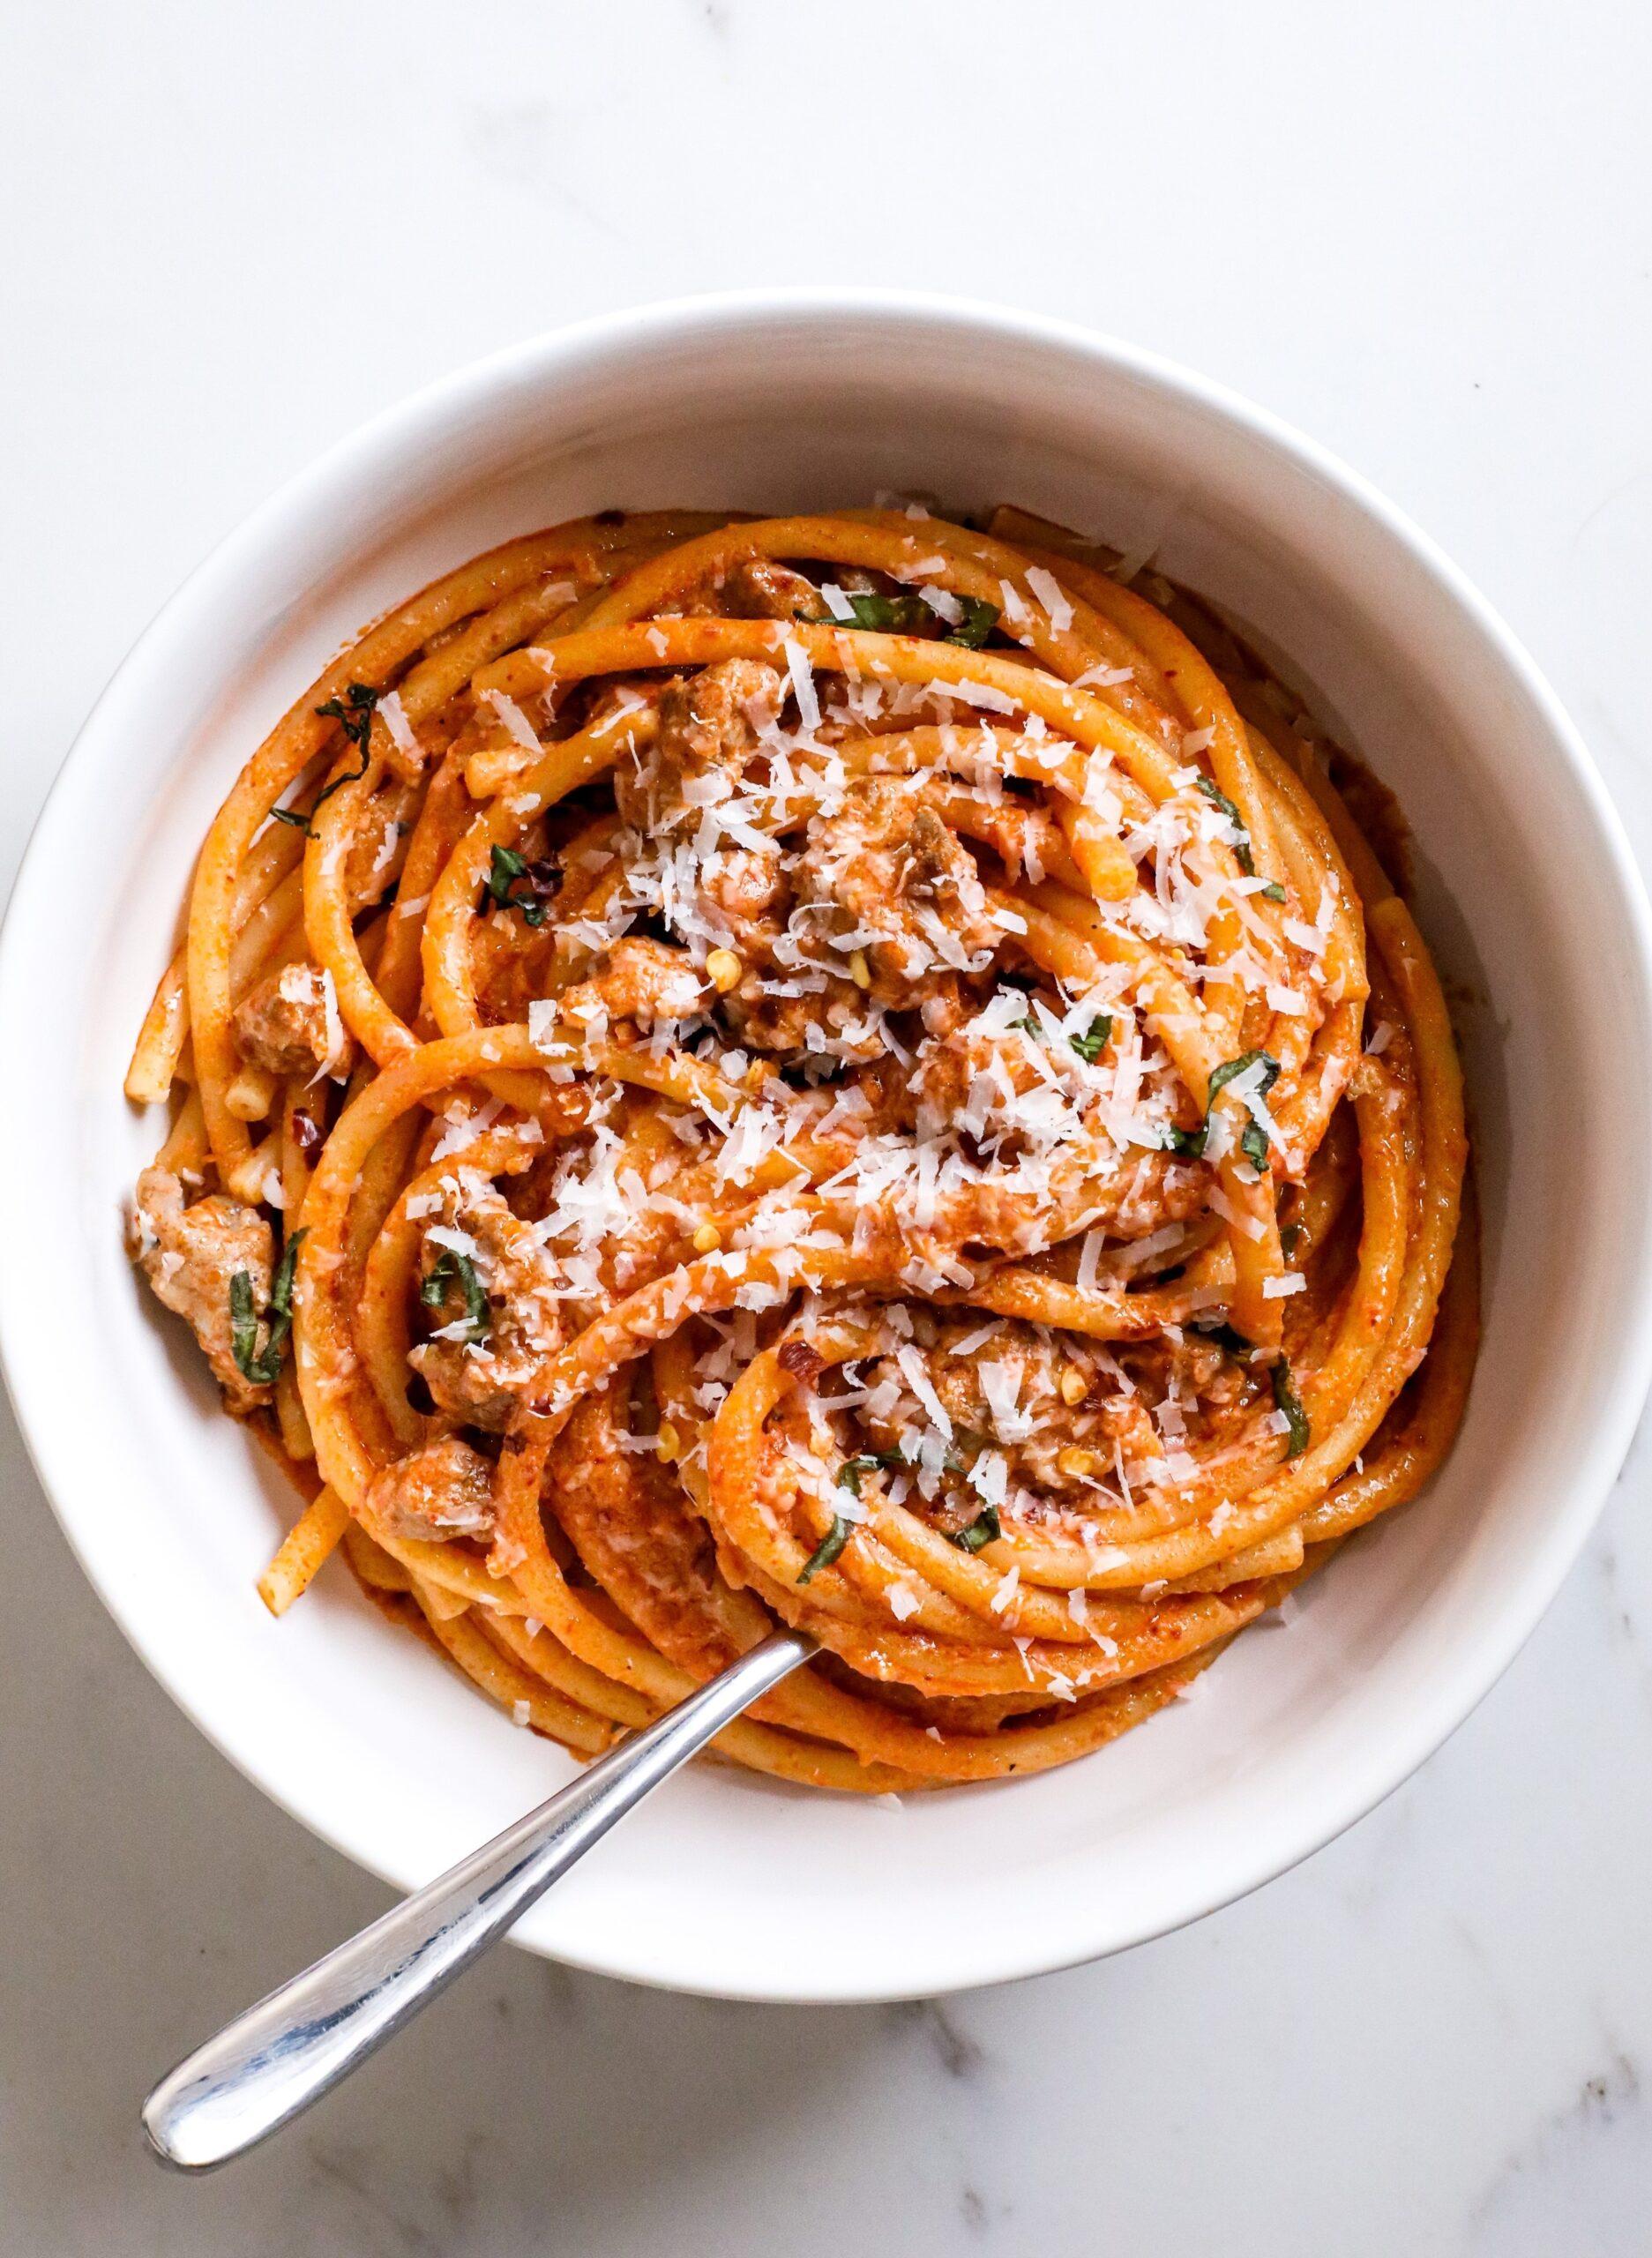 spicy vodka pasta with sausage